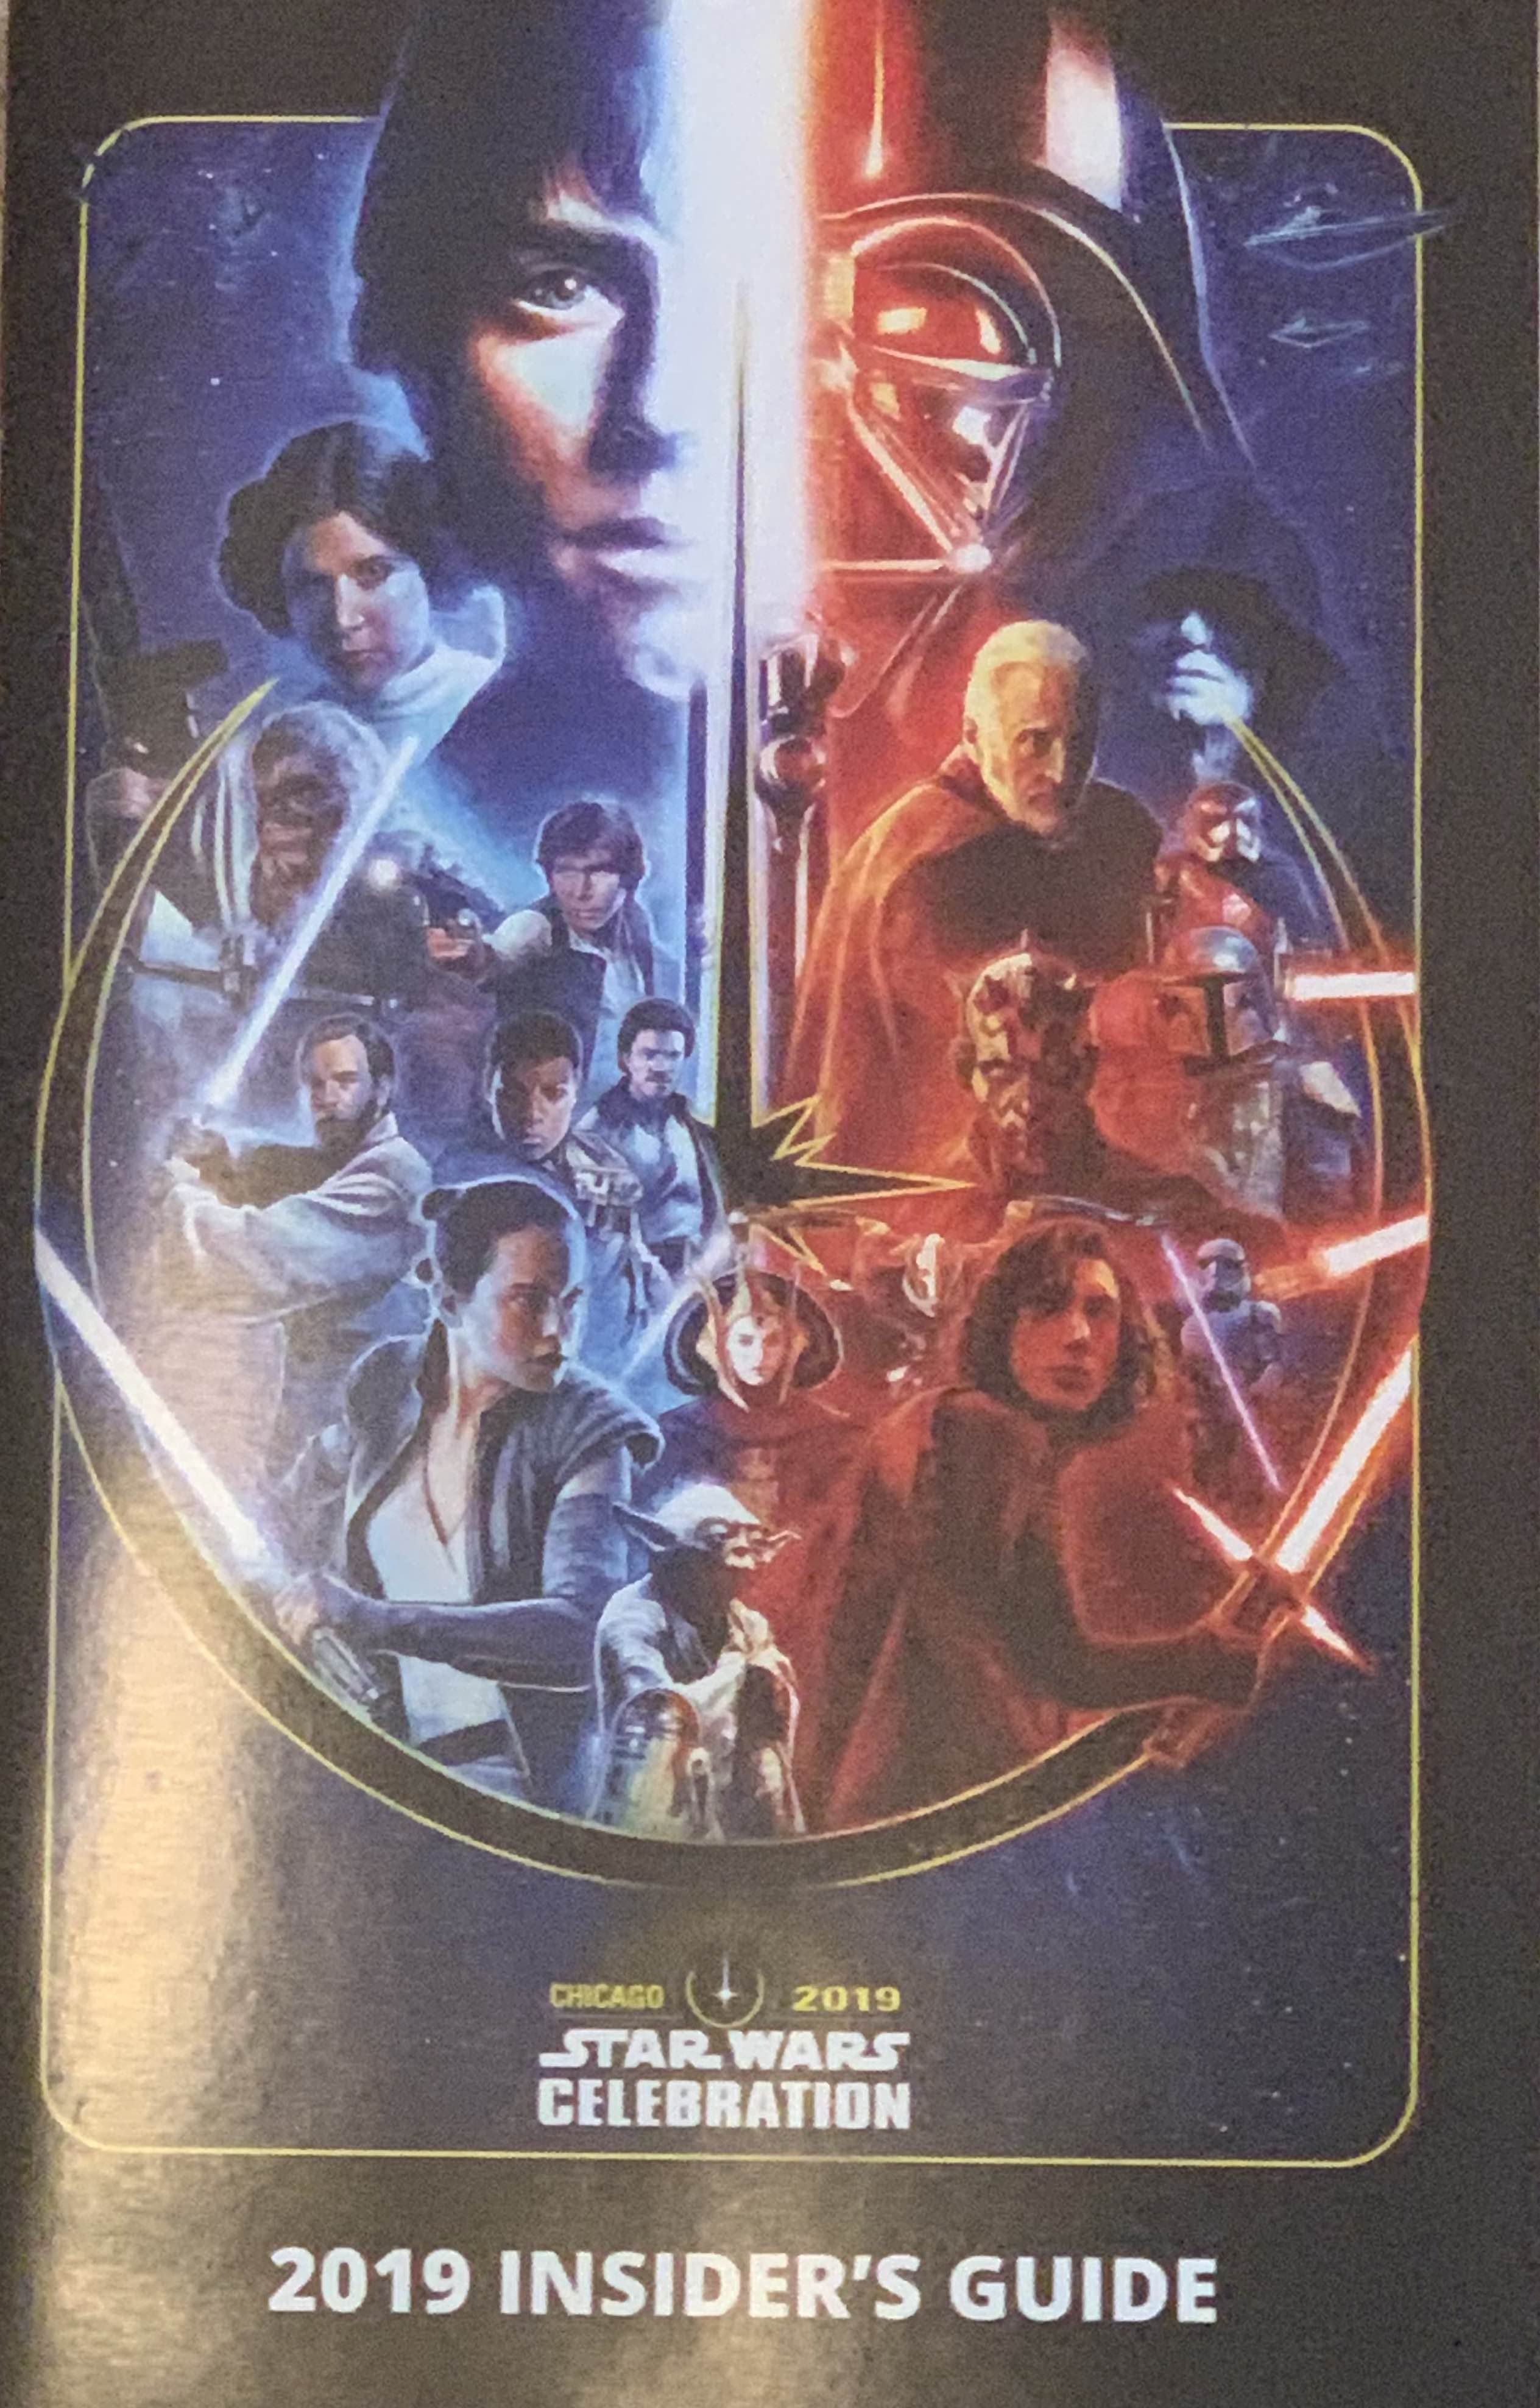 Star Wars Celebration Orlando 2019 Insider's Guide